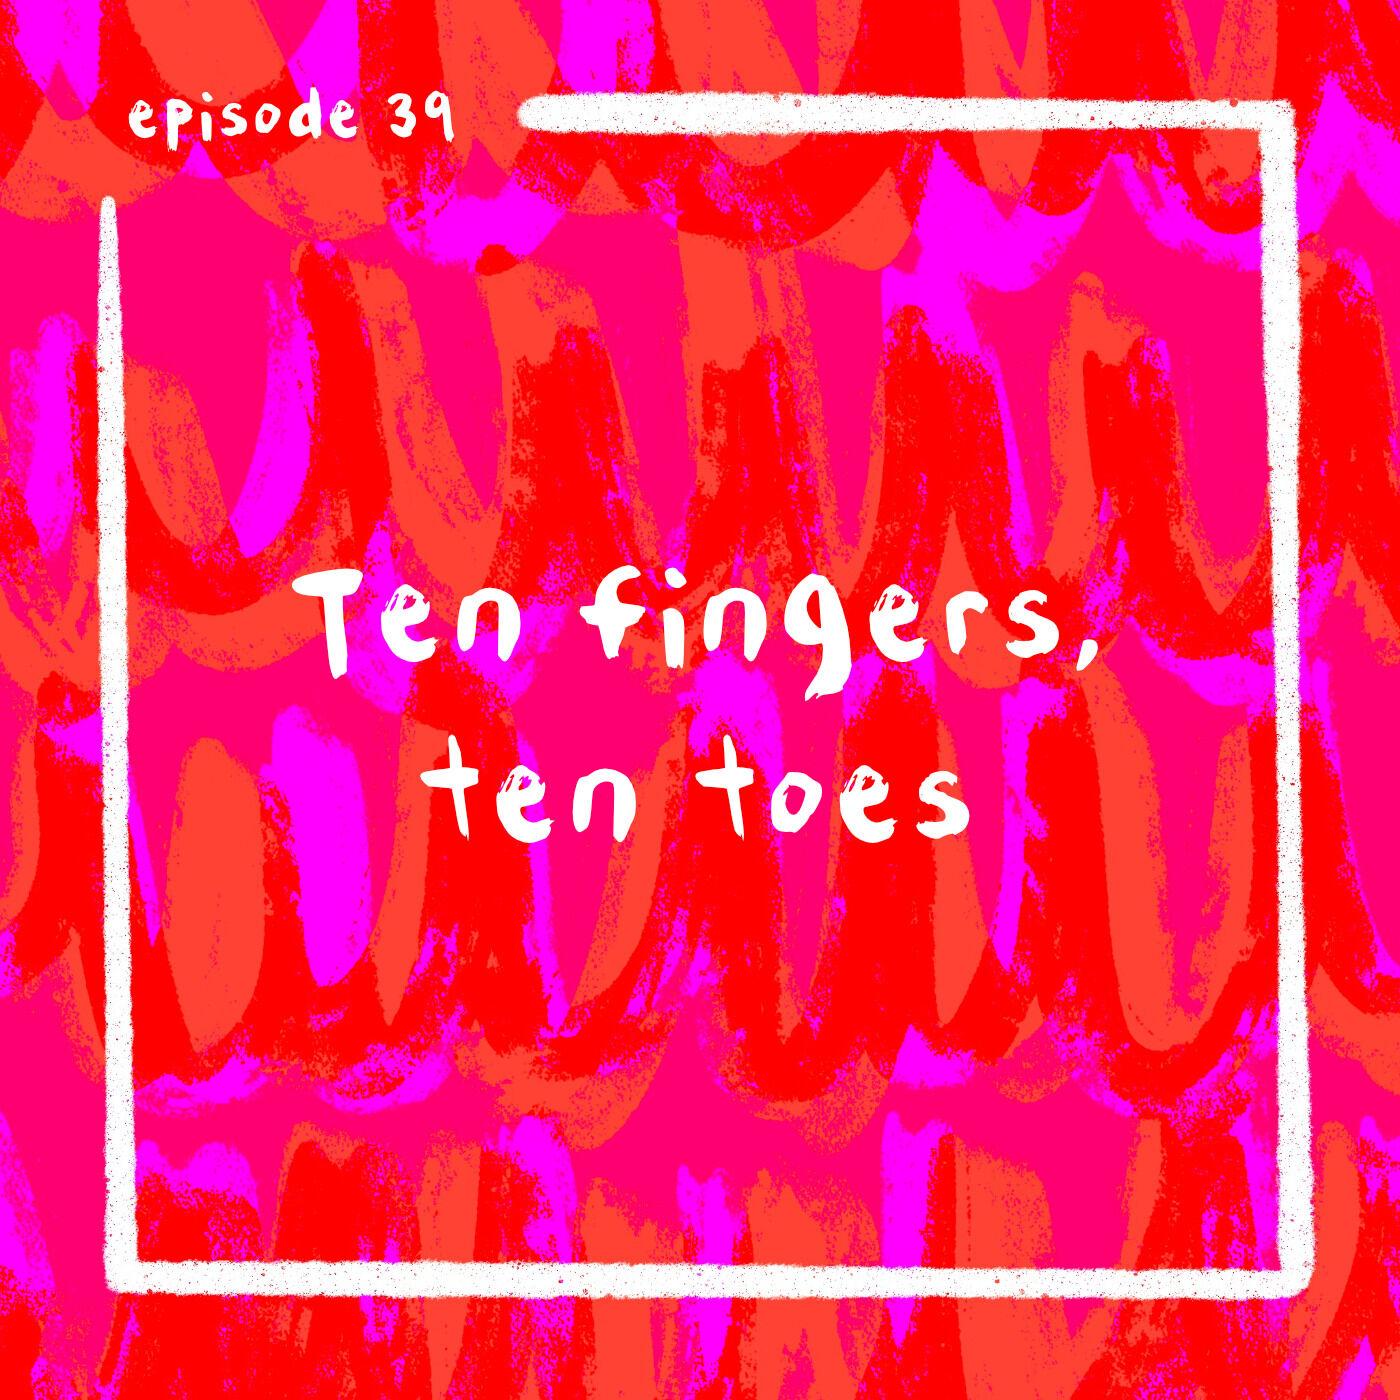 Episode cover art